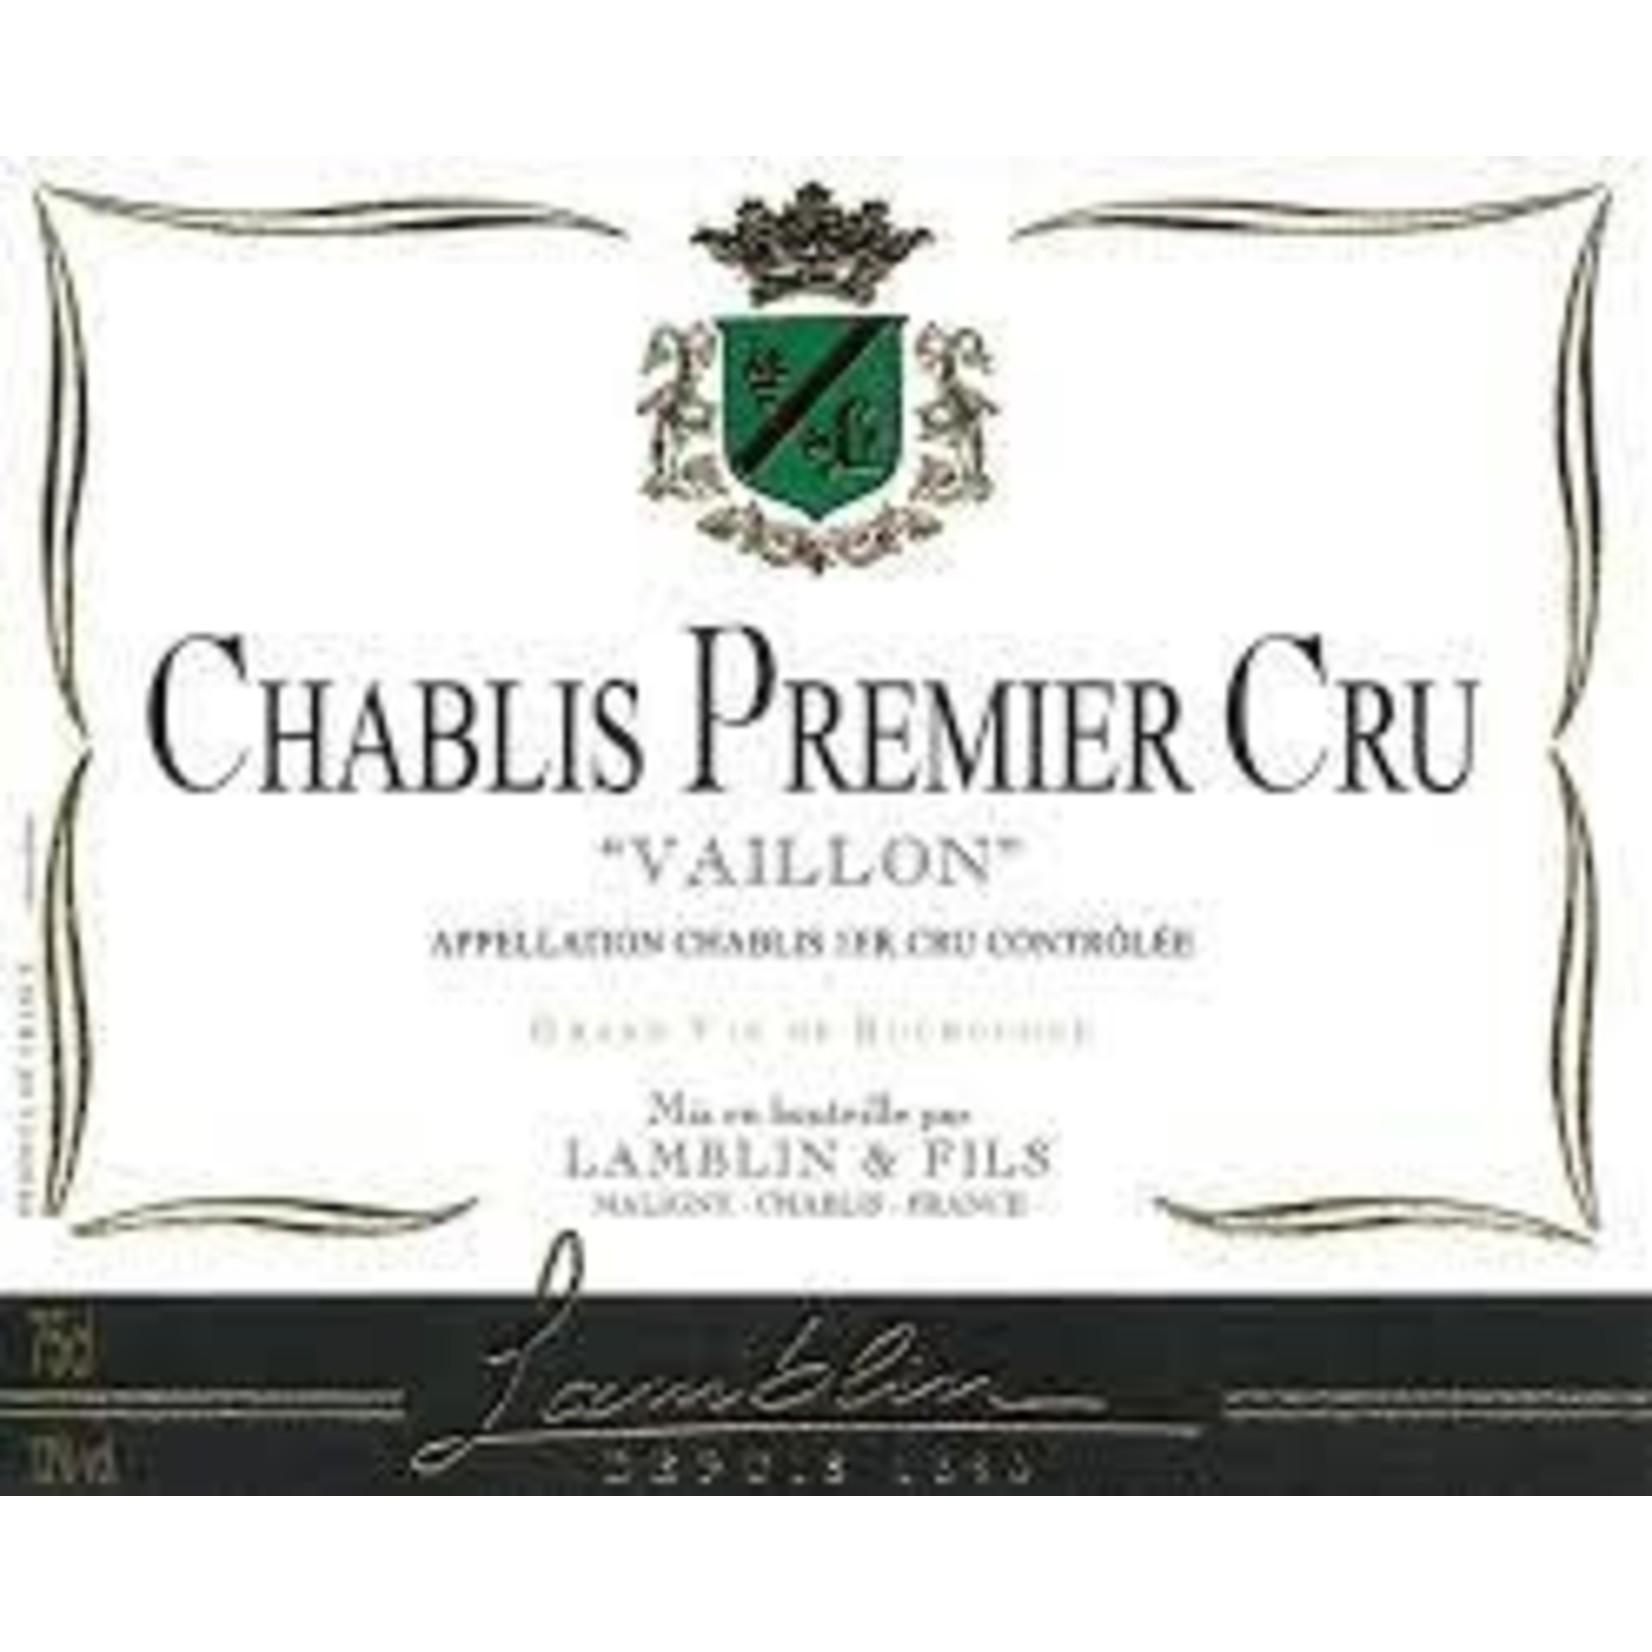 Wine Lamblin & Fils Chablis Premier Cru Vaillons 2018